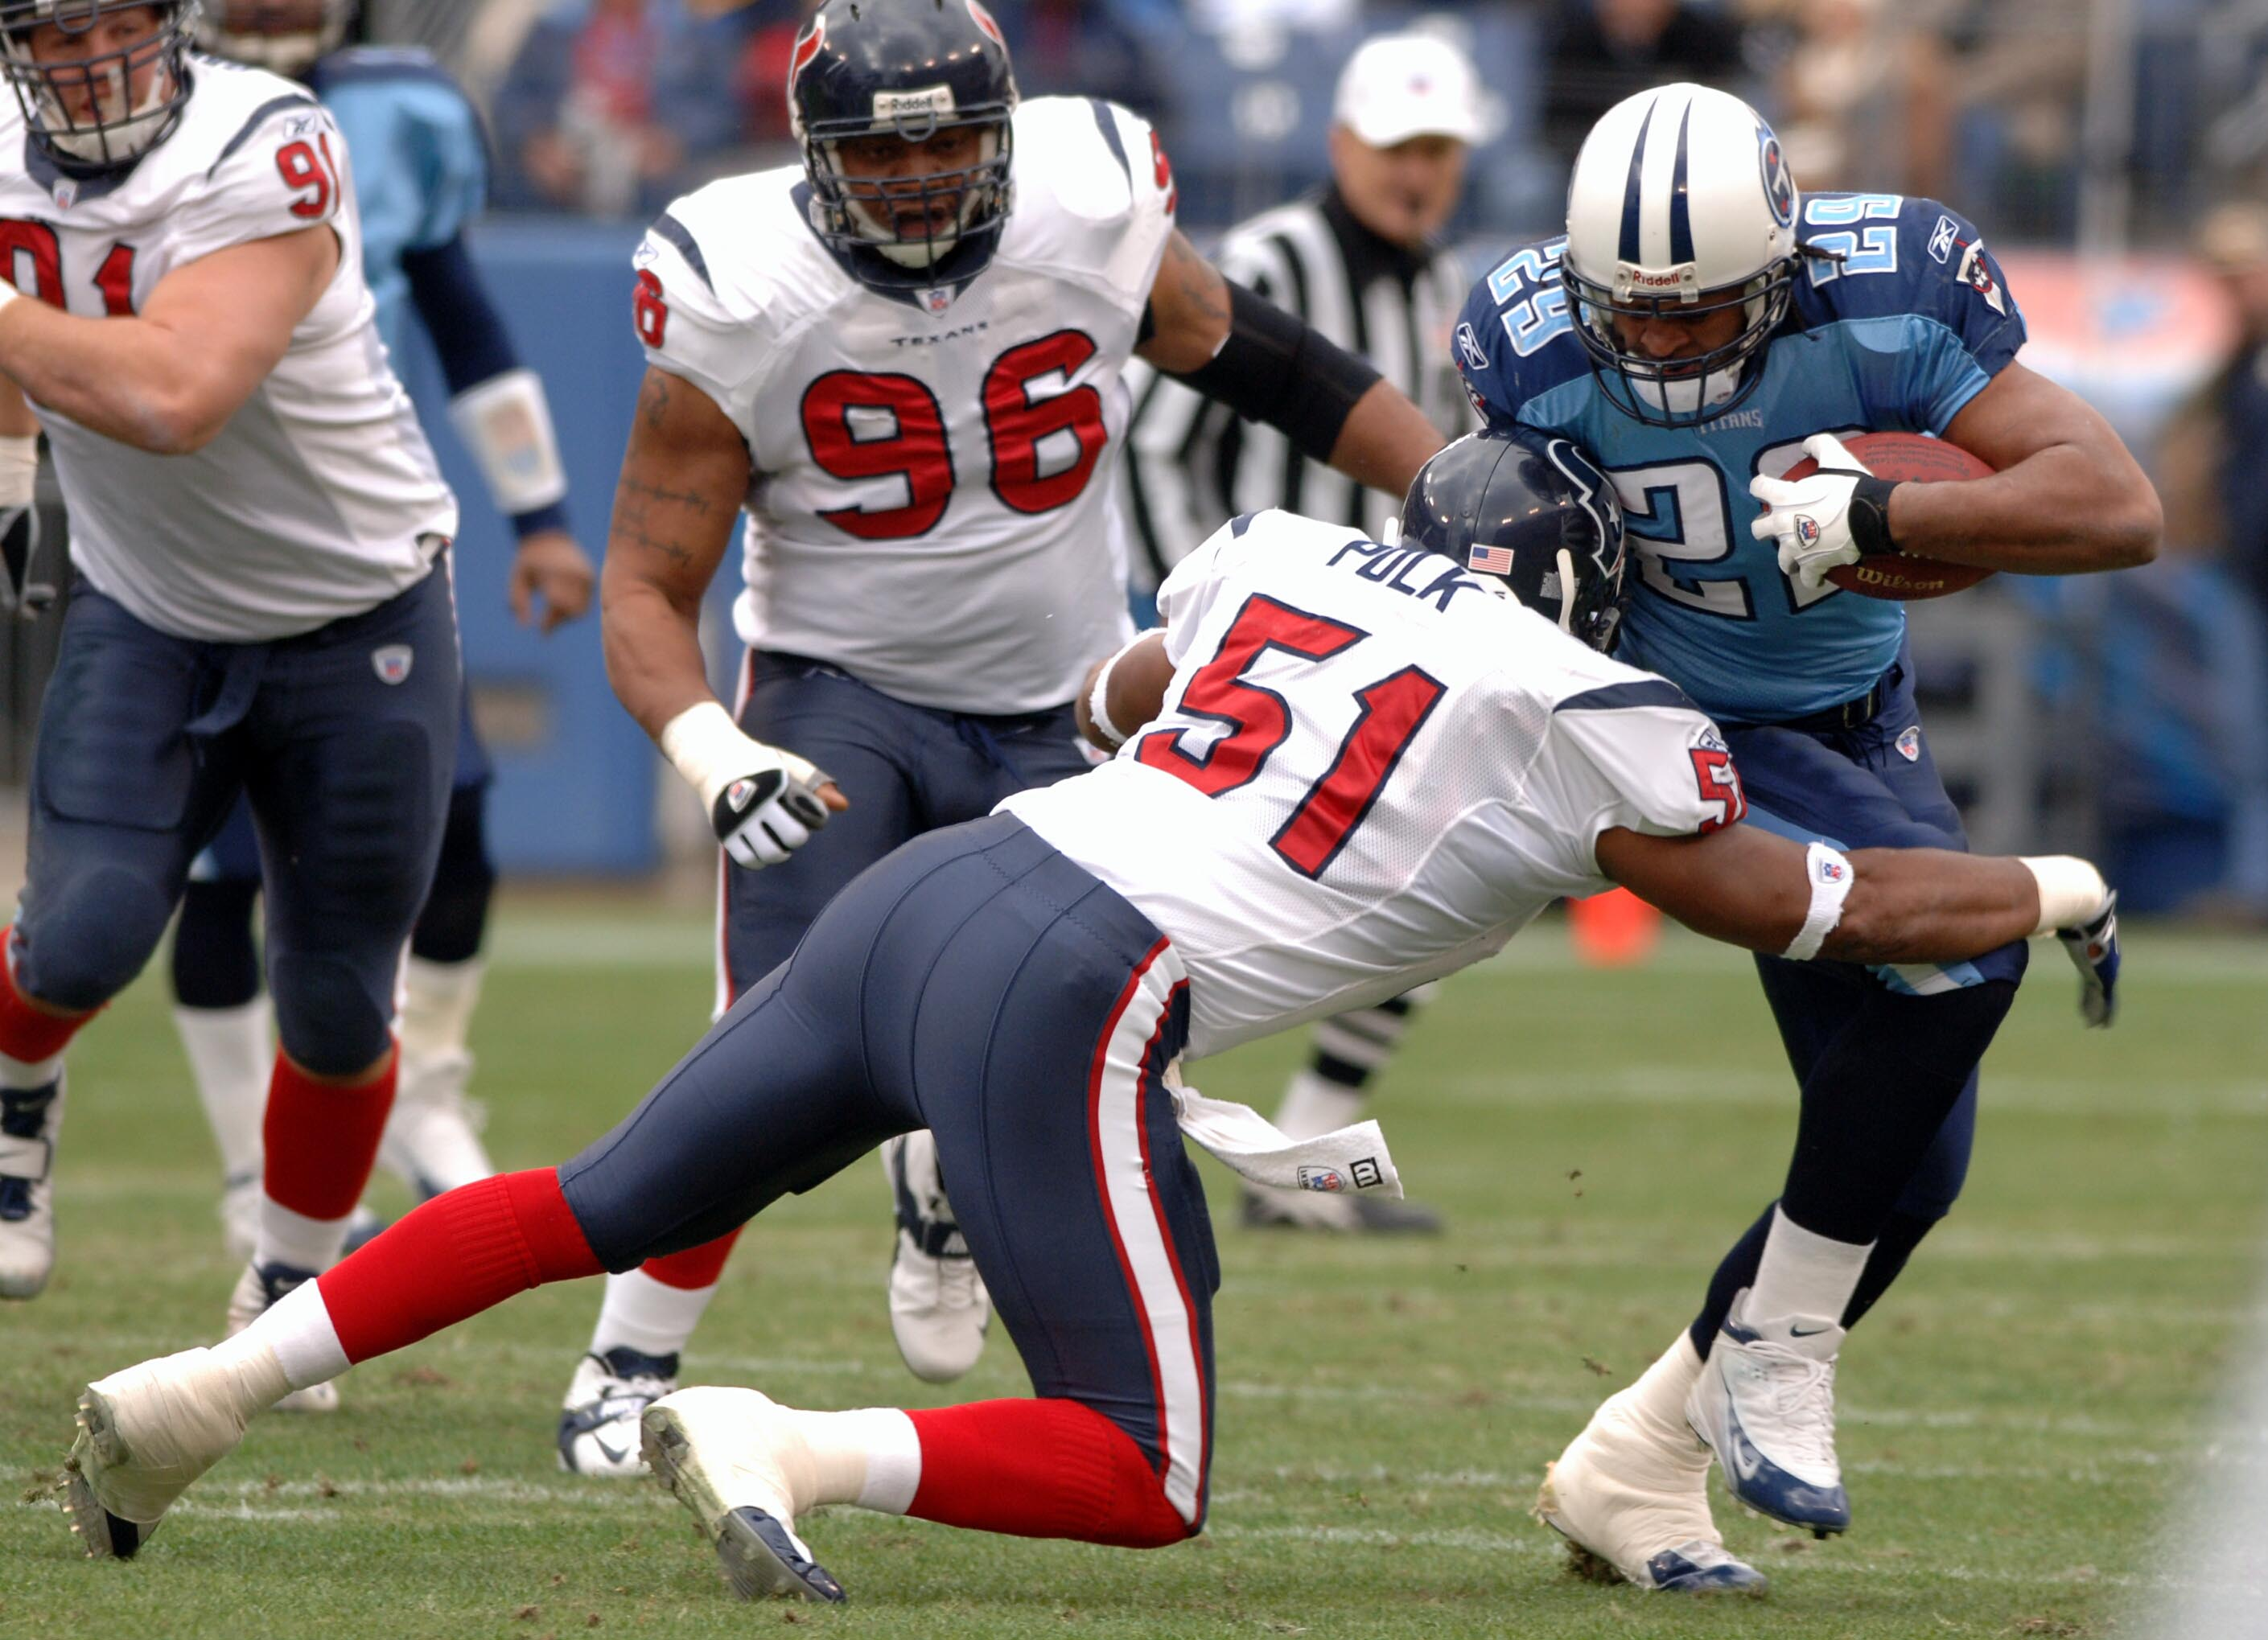 Houston Texans vs Tennessee Titans - December 11, 2005